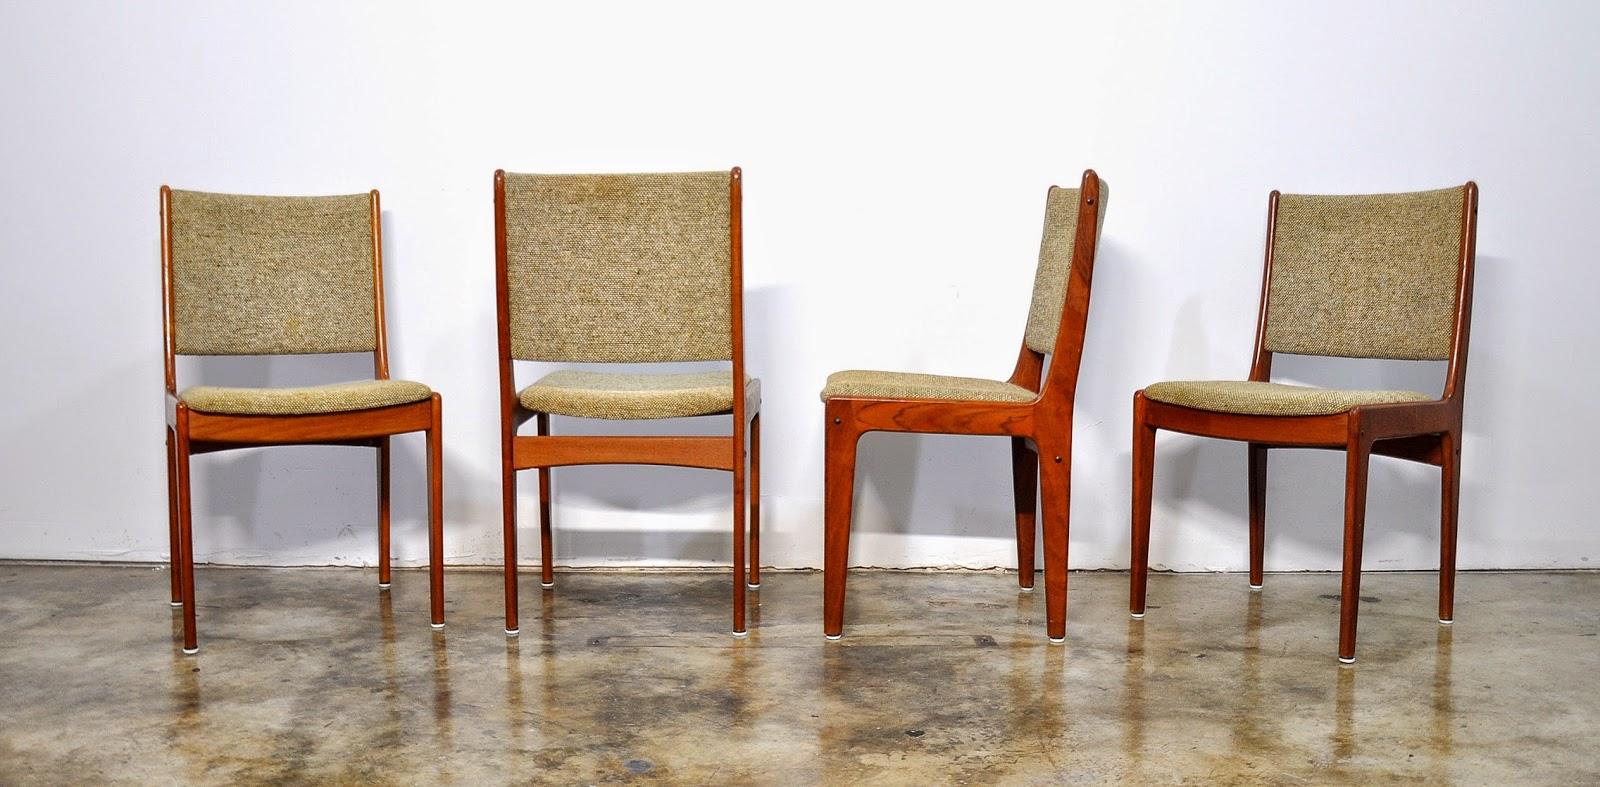 SELECT MODERN Set of 4 Danish Modern Teak Dining Chairs : ScandinavianTeakDiningChairs3 from midcenturymoderndesignfinds.blogspot.com size 1600 x 787 jpeg 263kB